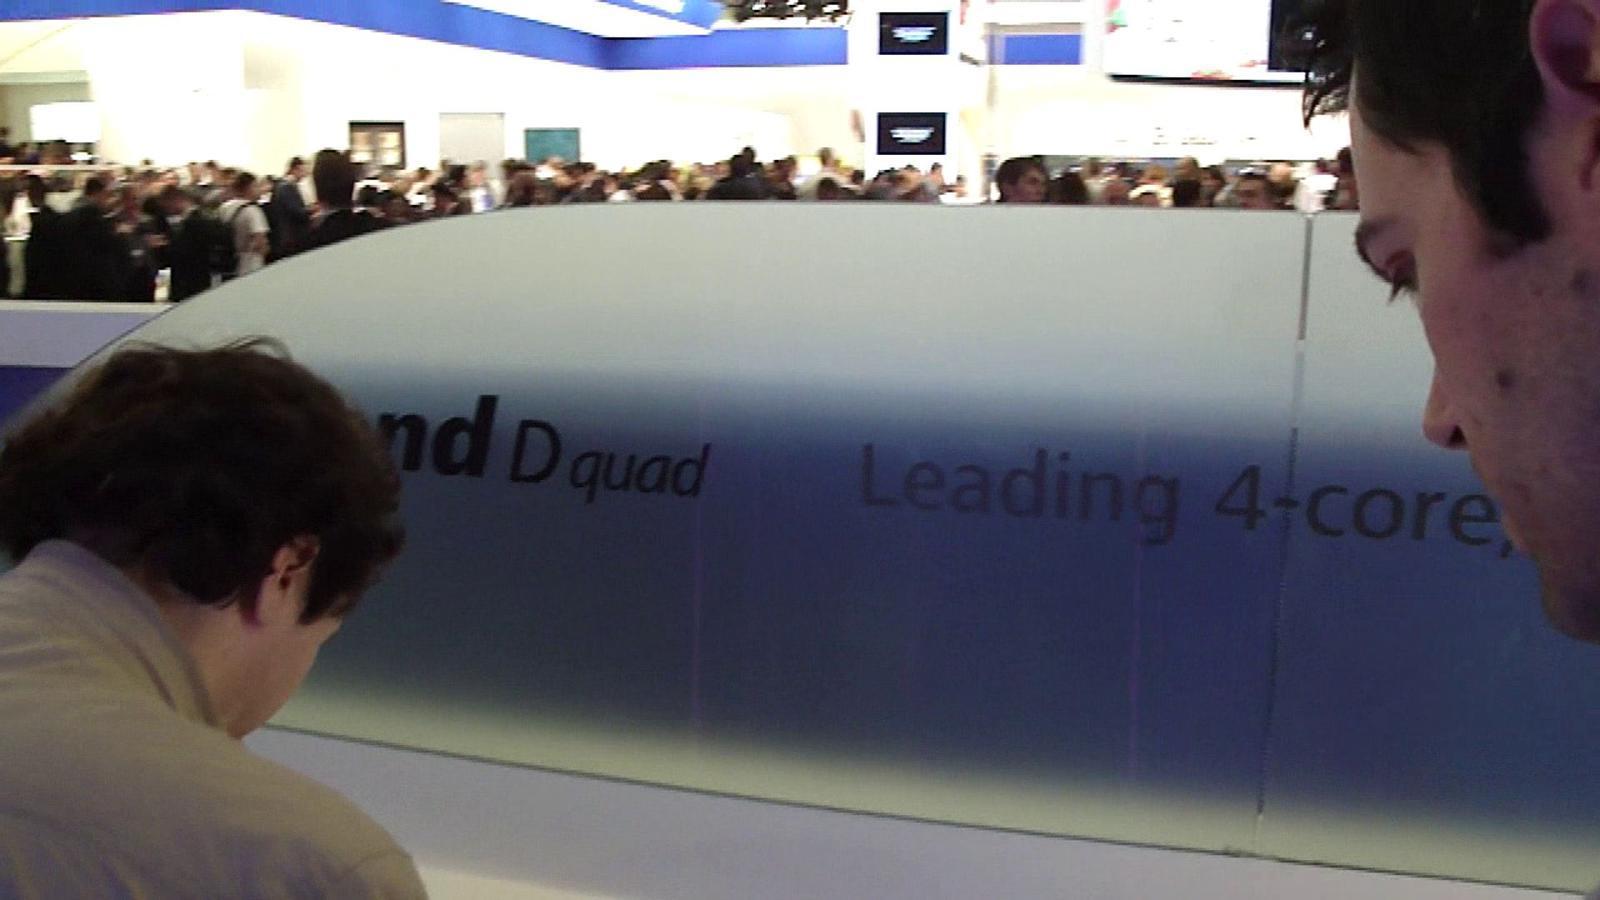 [MWC 2012] Vídeo: Huawei Ascend D Quad